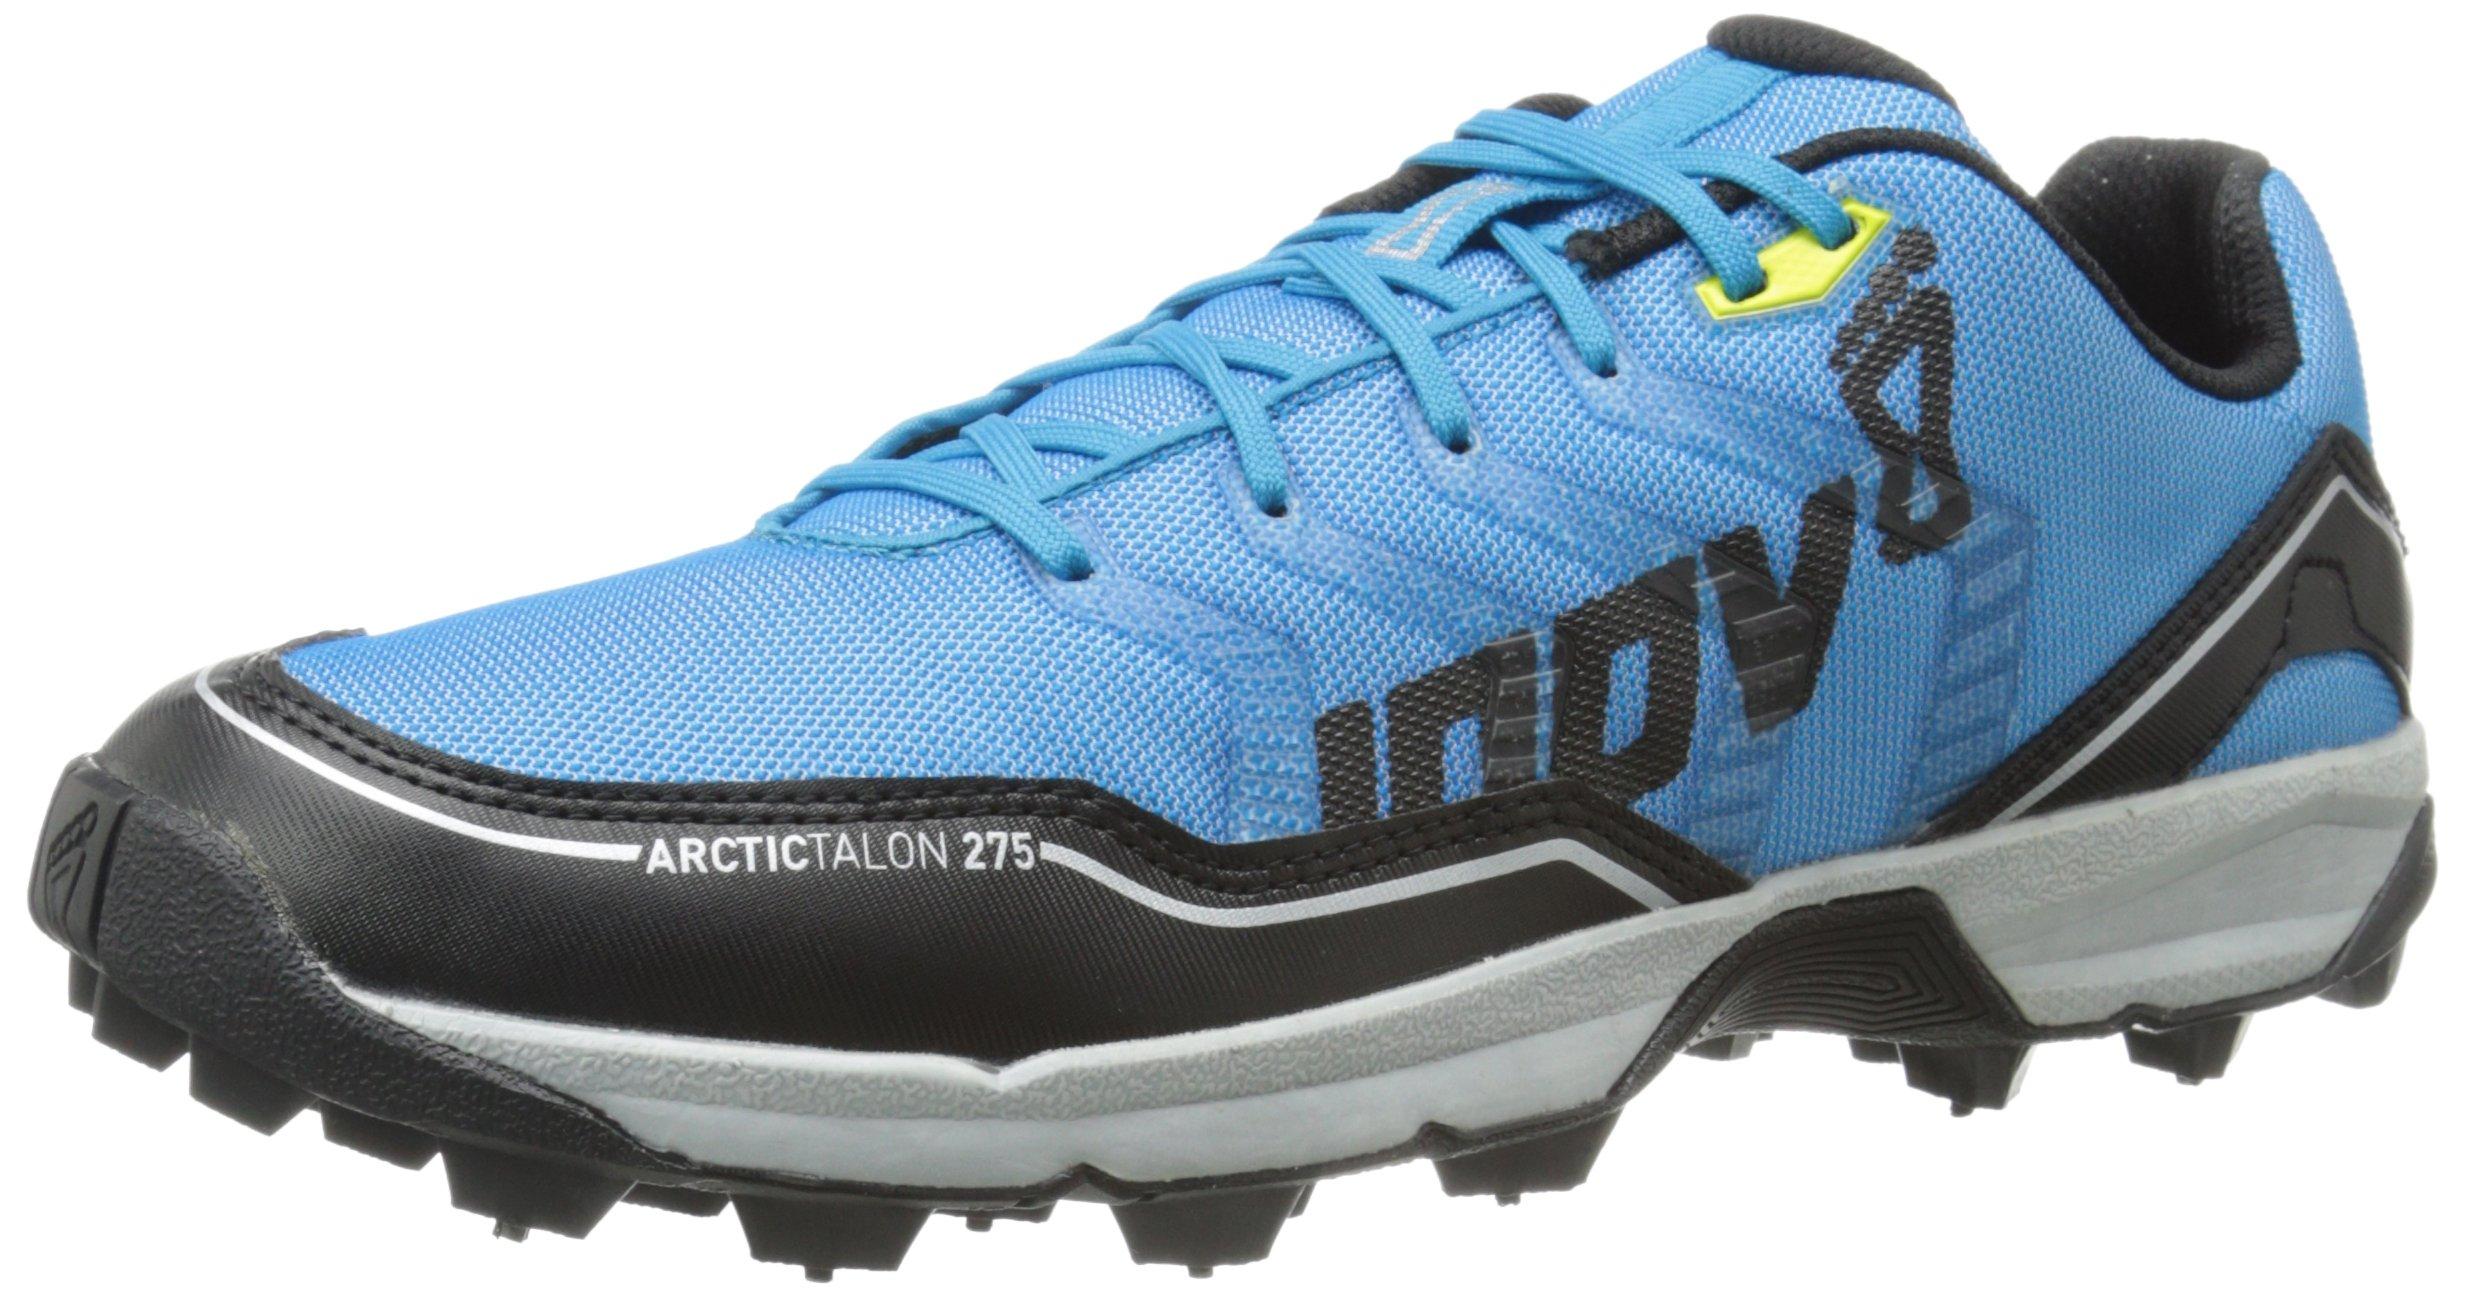 Inov-8 Arctic Talon 275 Trail Running Shoe, Blue/Black/Silver/Yellow, 9 C US